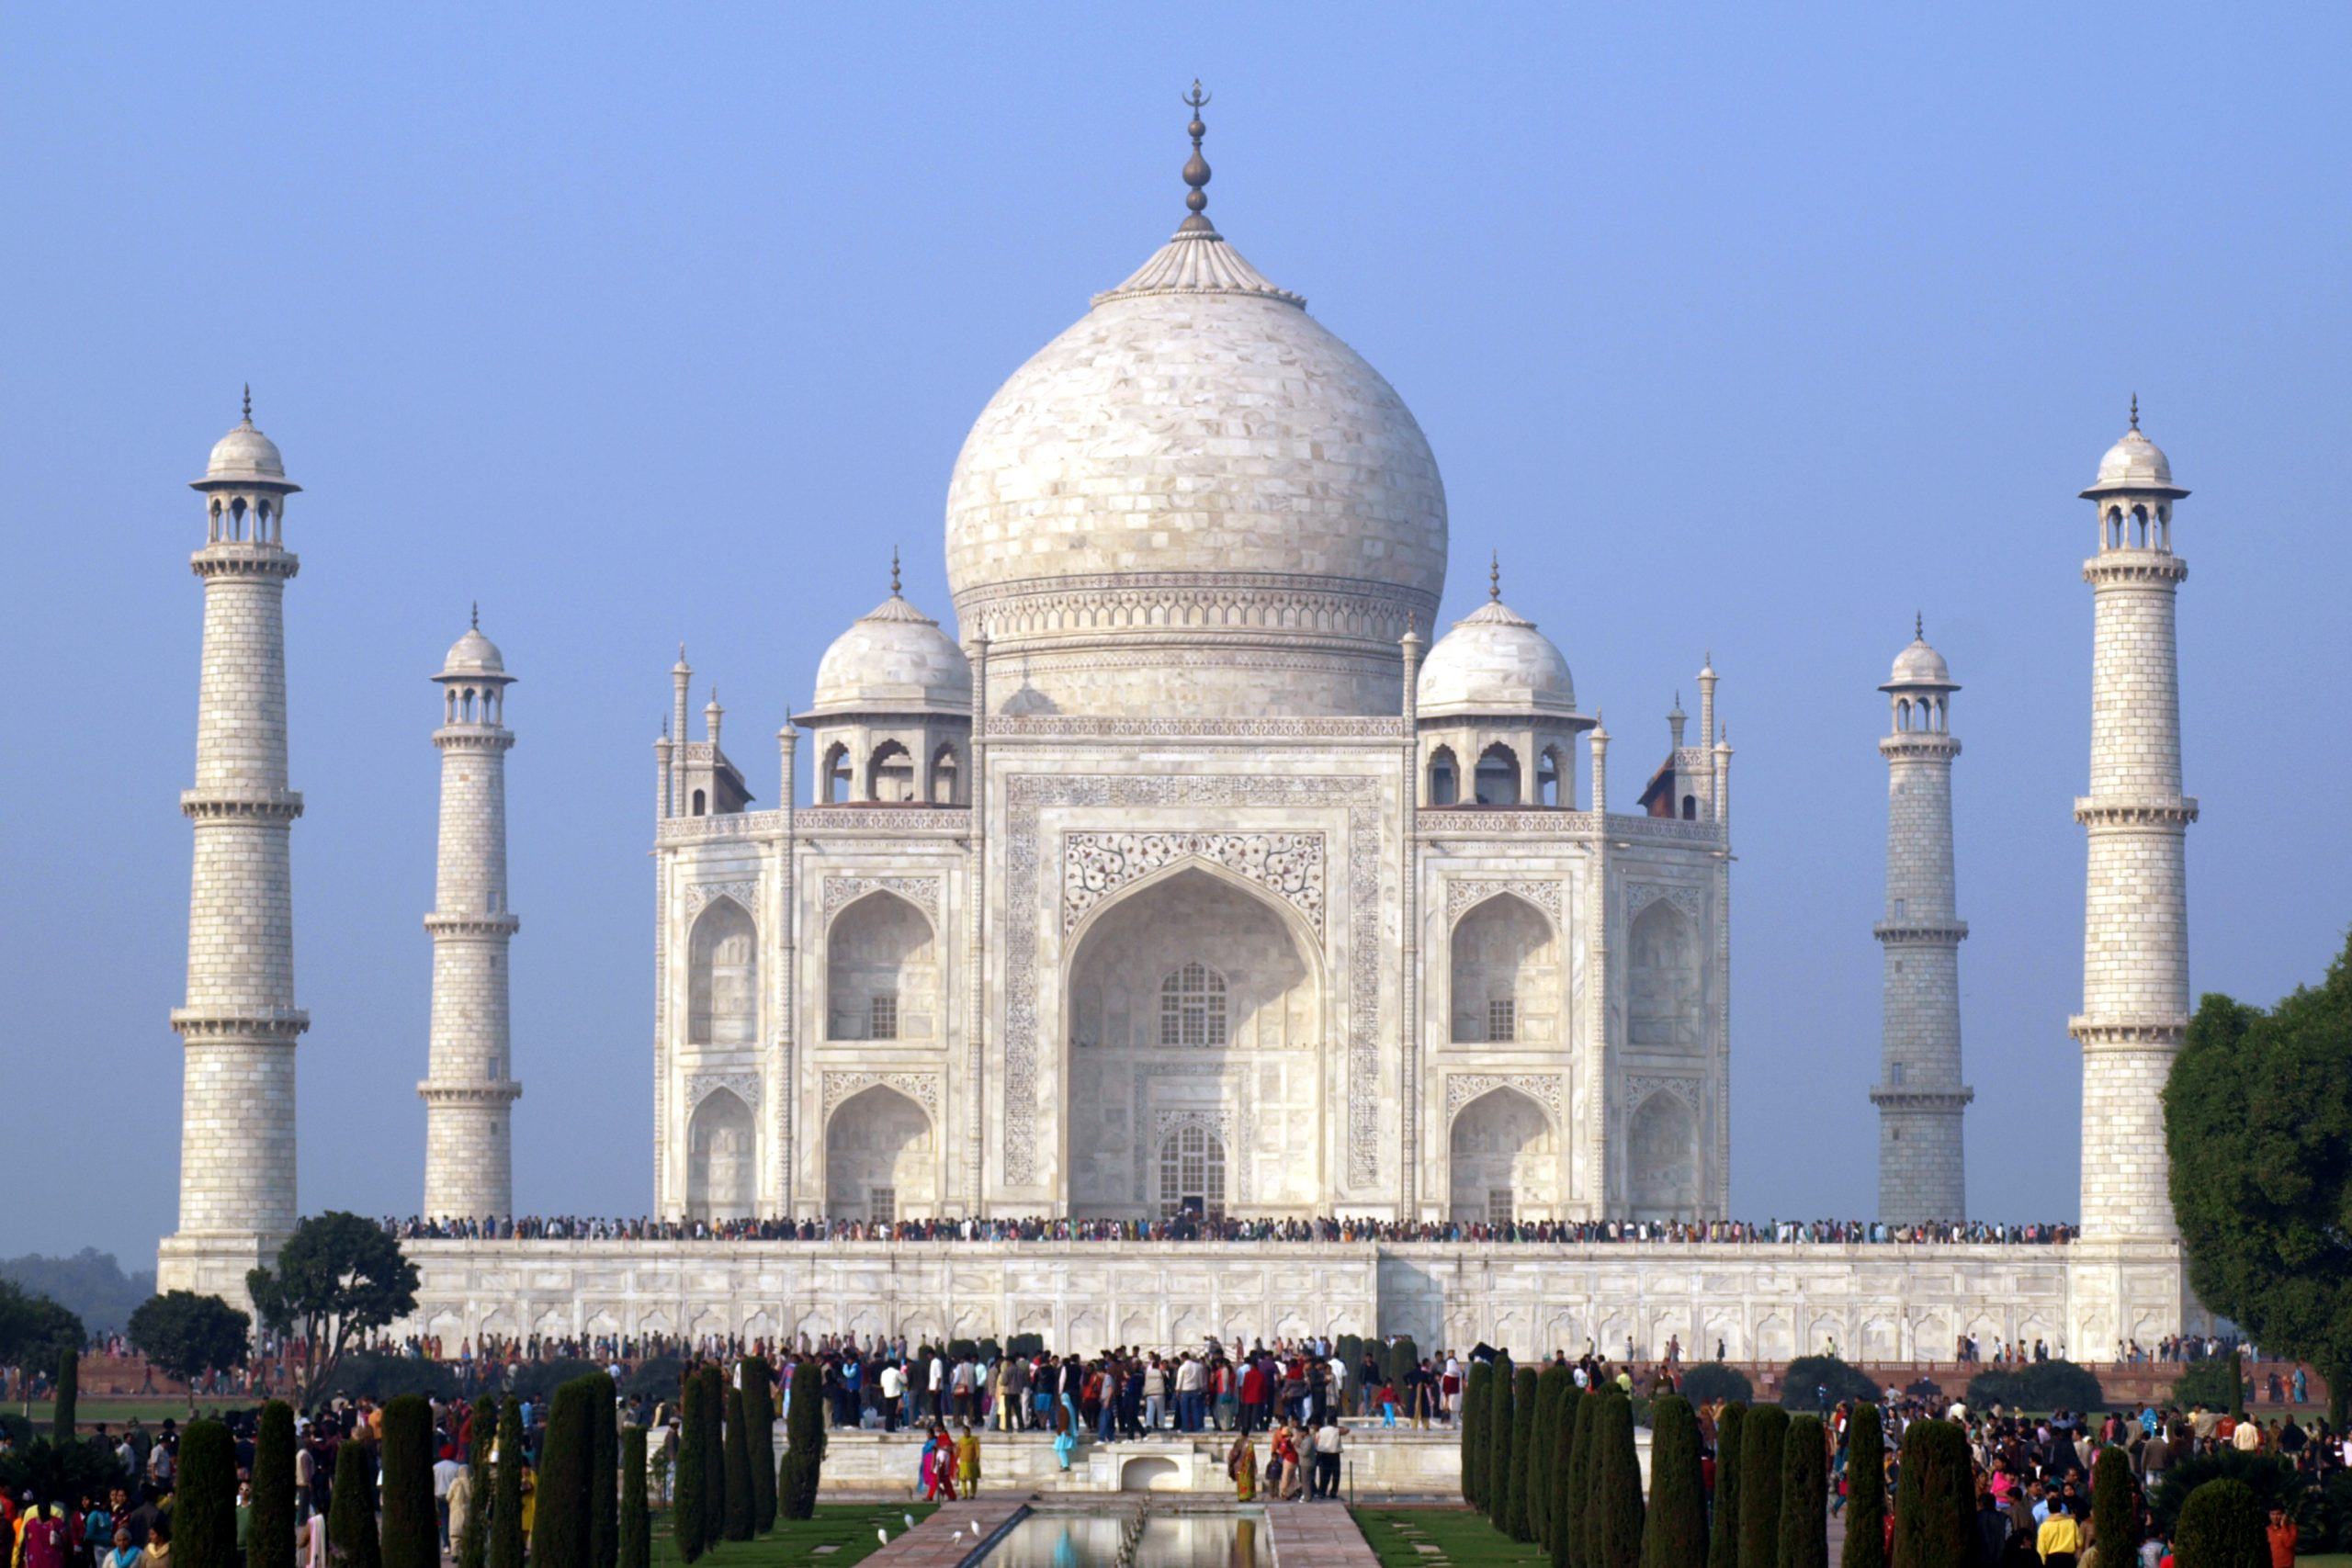 Shining beauty of Taj Mahal